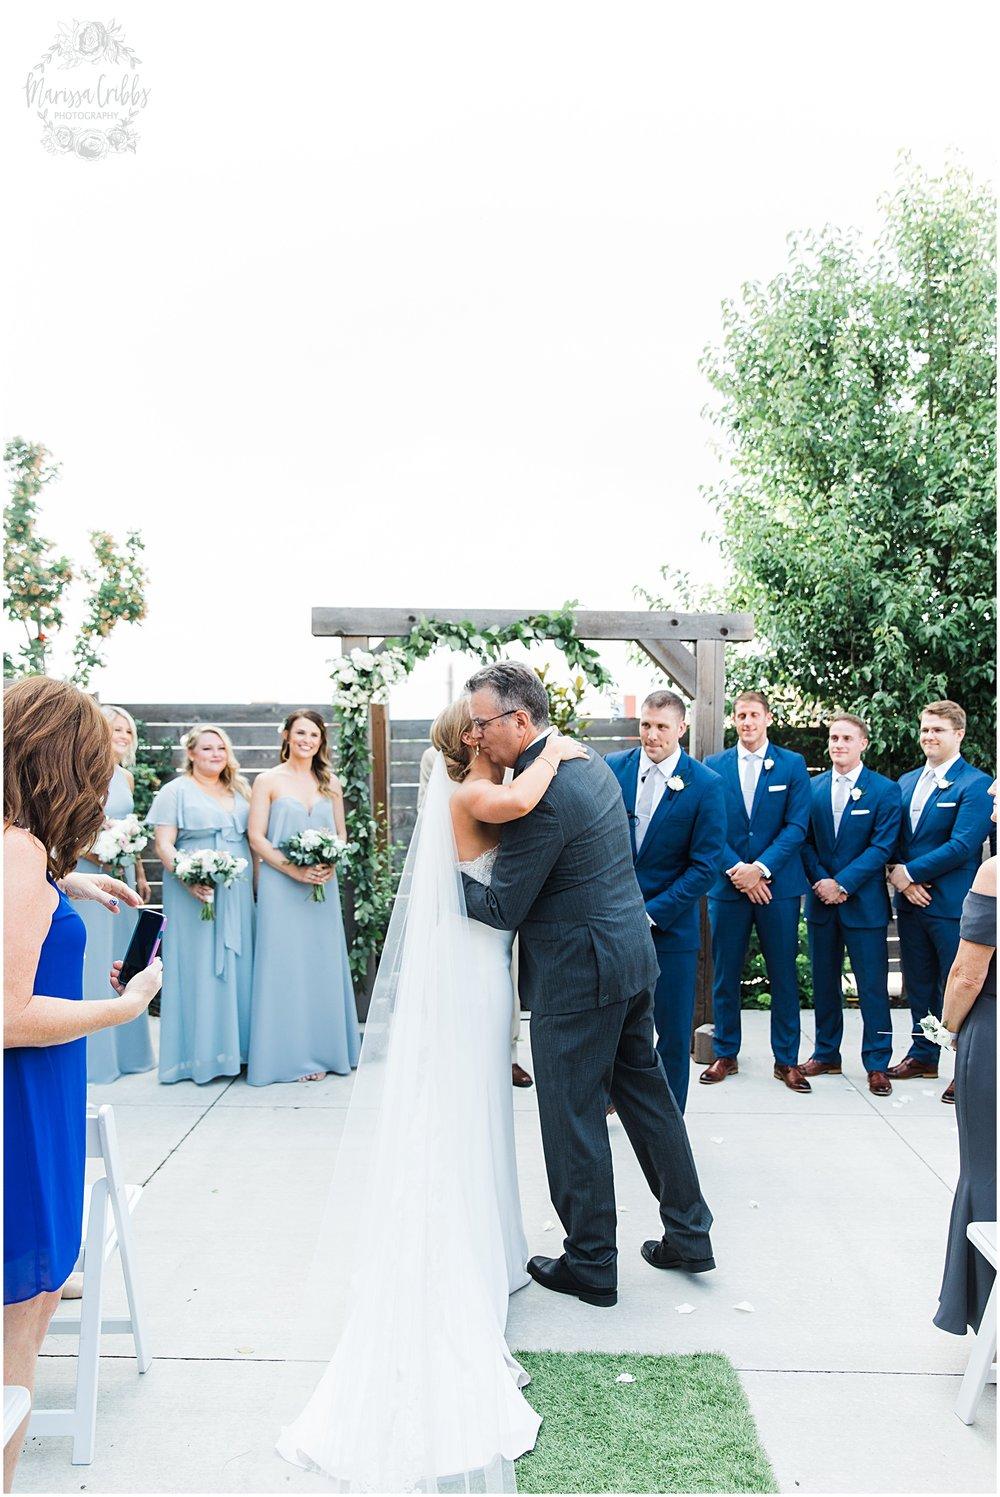 MAGNOLIA VENUE WEDDING | CHARLIE & NATALIE | MARISSA CRIBBS PHOTOGRAPHY_5755.jpg